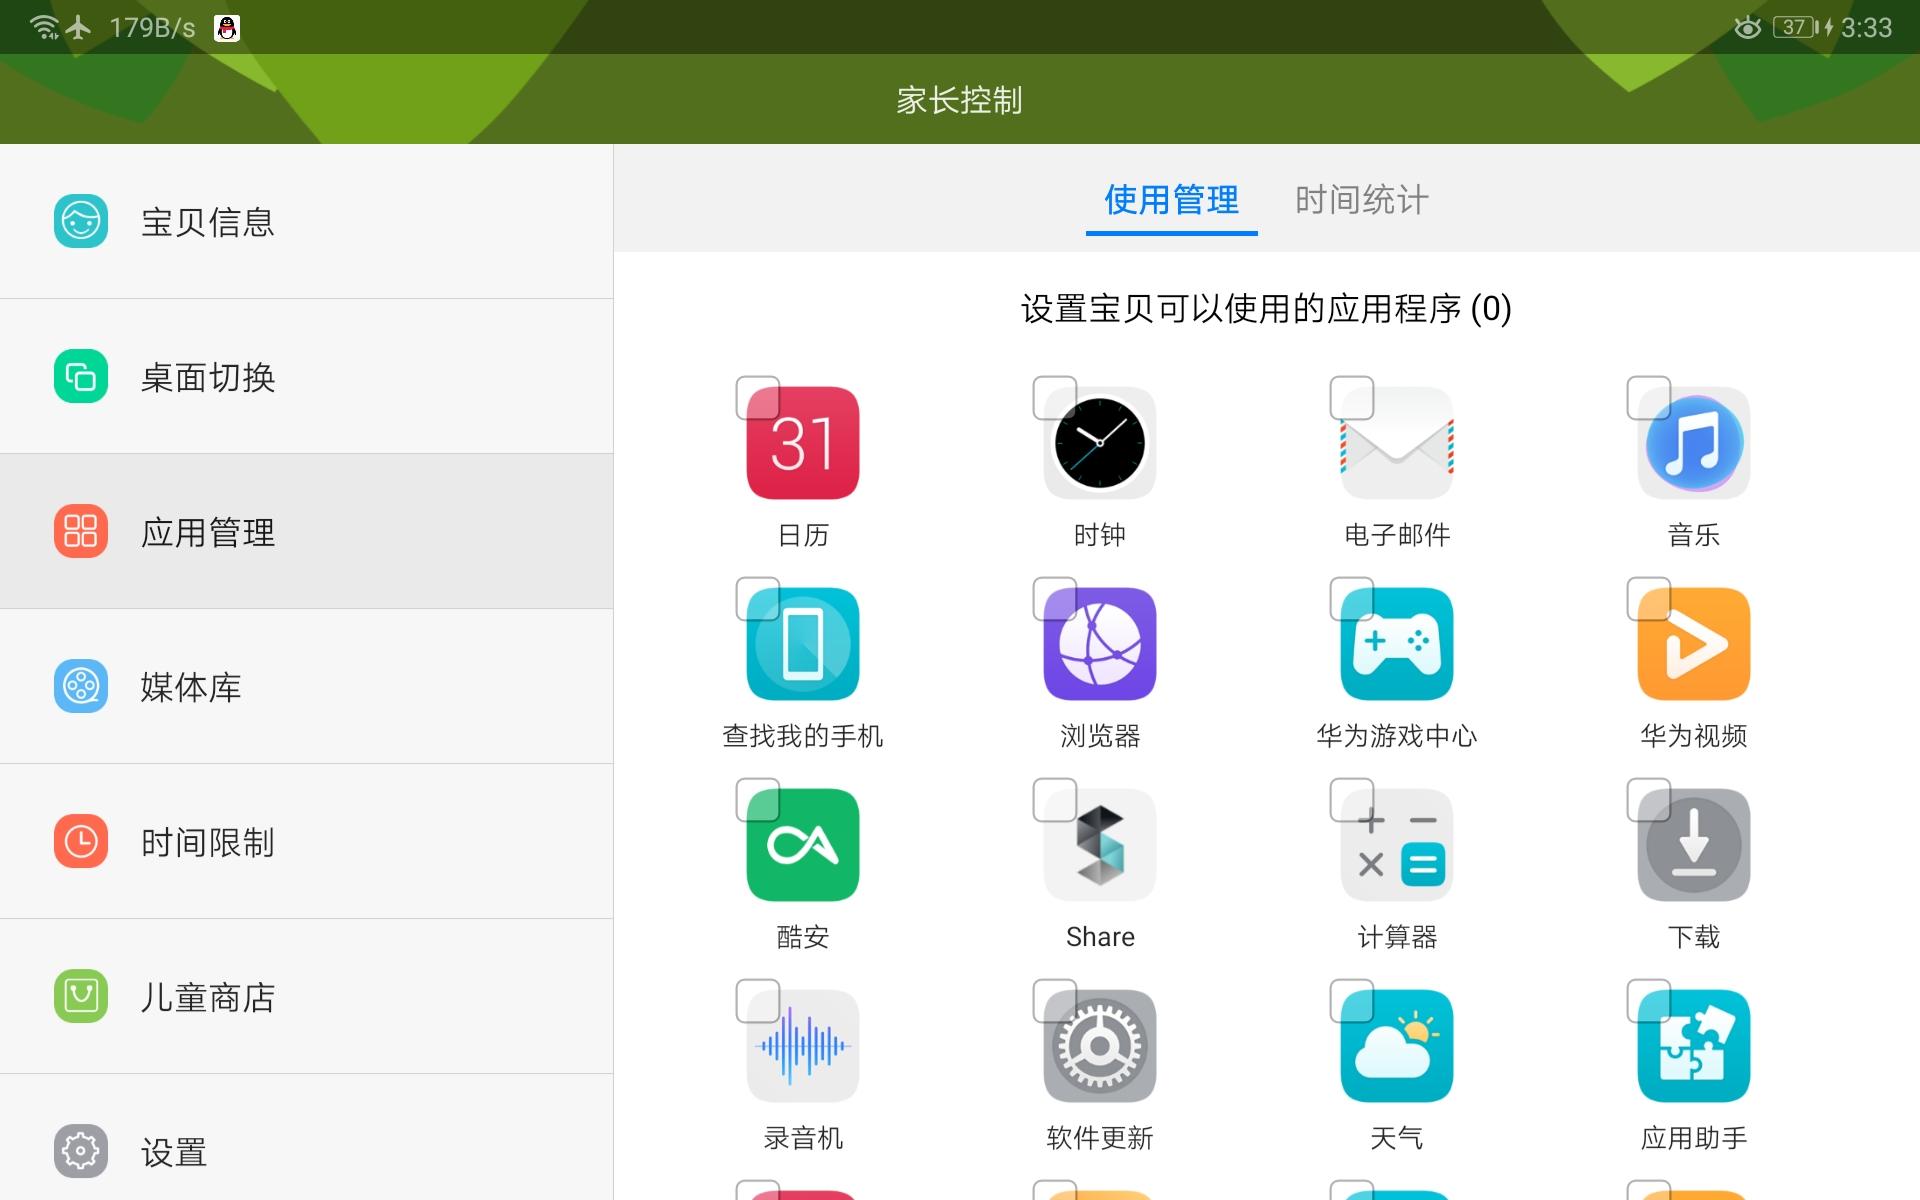 Screenshot_20190816_153310_com.huawei.kidsmode.jpg